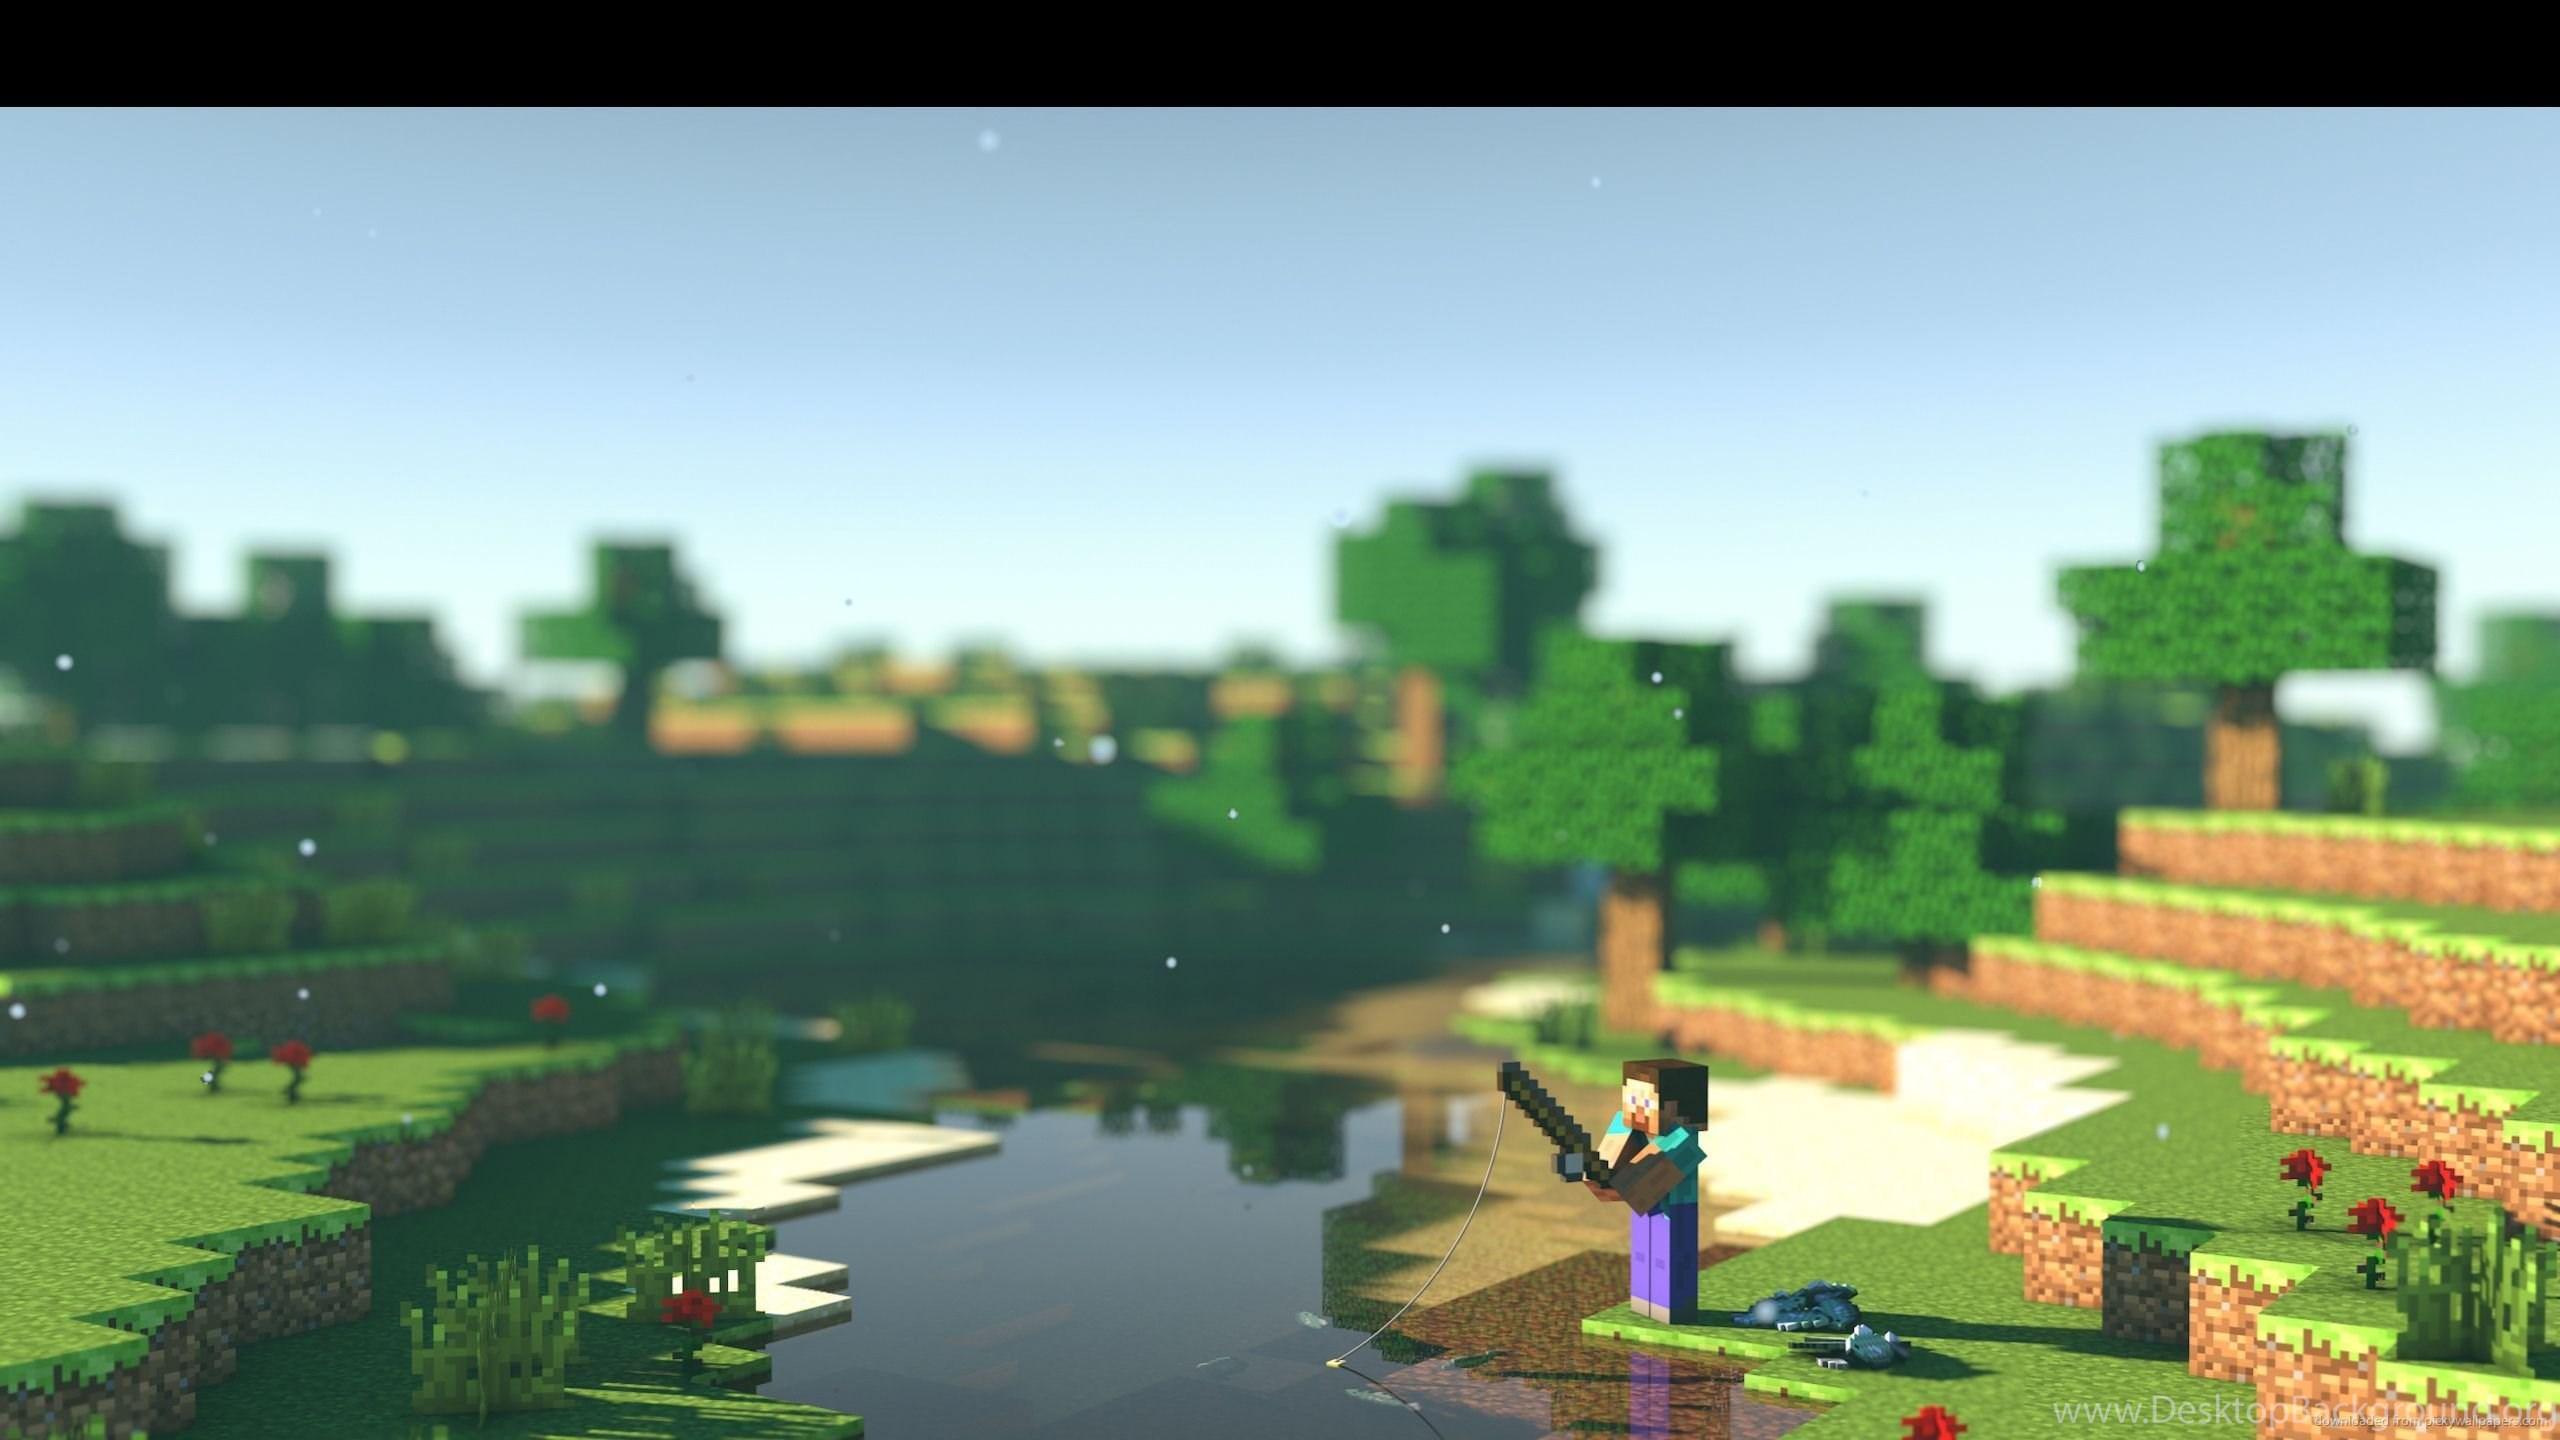 Wonderful Wallpaper Minecraft Samsung - 108213_download-2560x1440-minecraft-fishing-wallpapers_2560x1440_h  Photograph_1002953.jpg